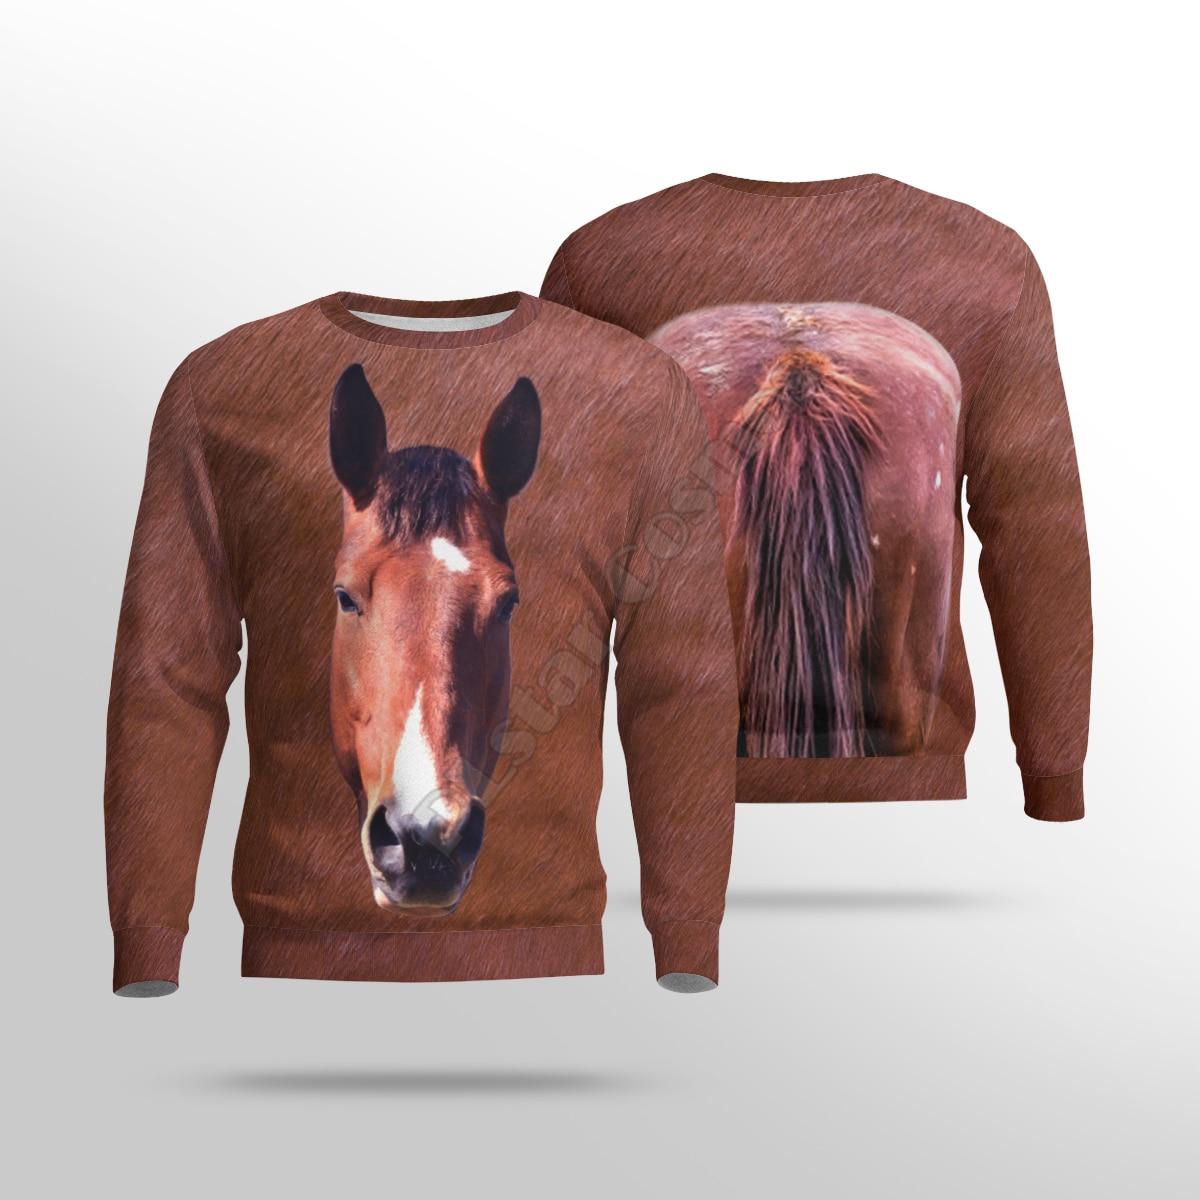 Funny Horse 3d Printed Women For Men Sweater Sweatshirt Autumn Fashion Streetwear Pullover Long Sleeved Shirt 06